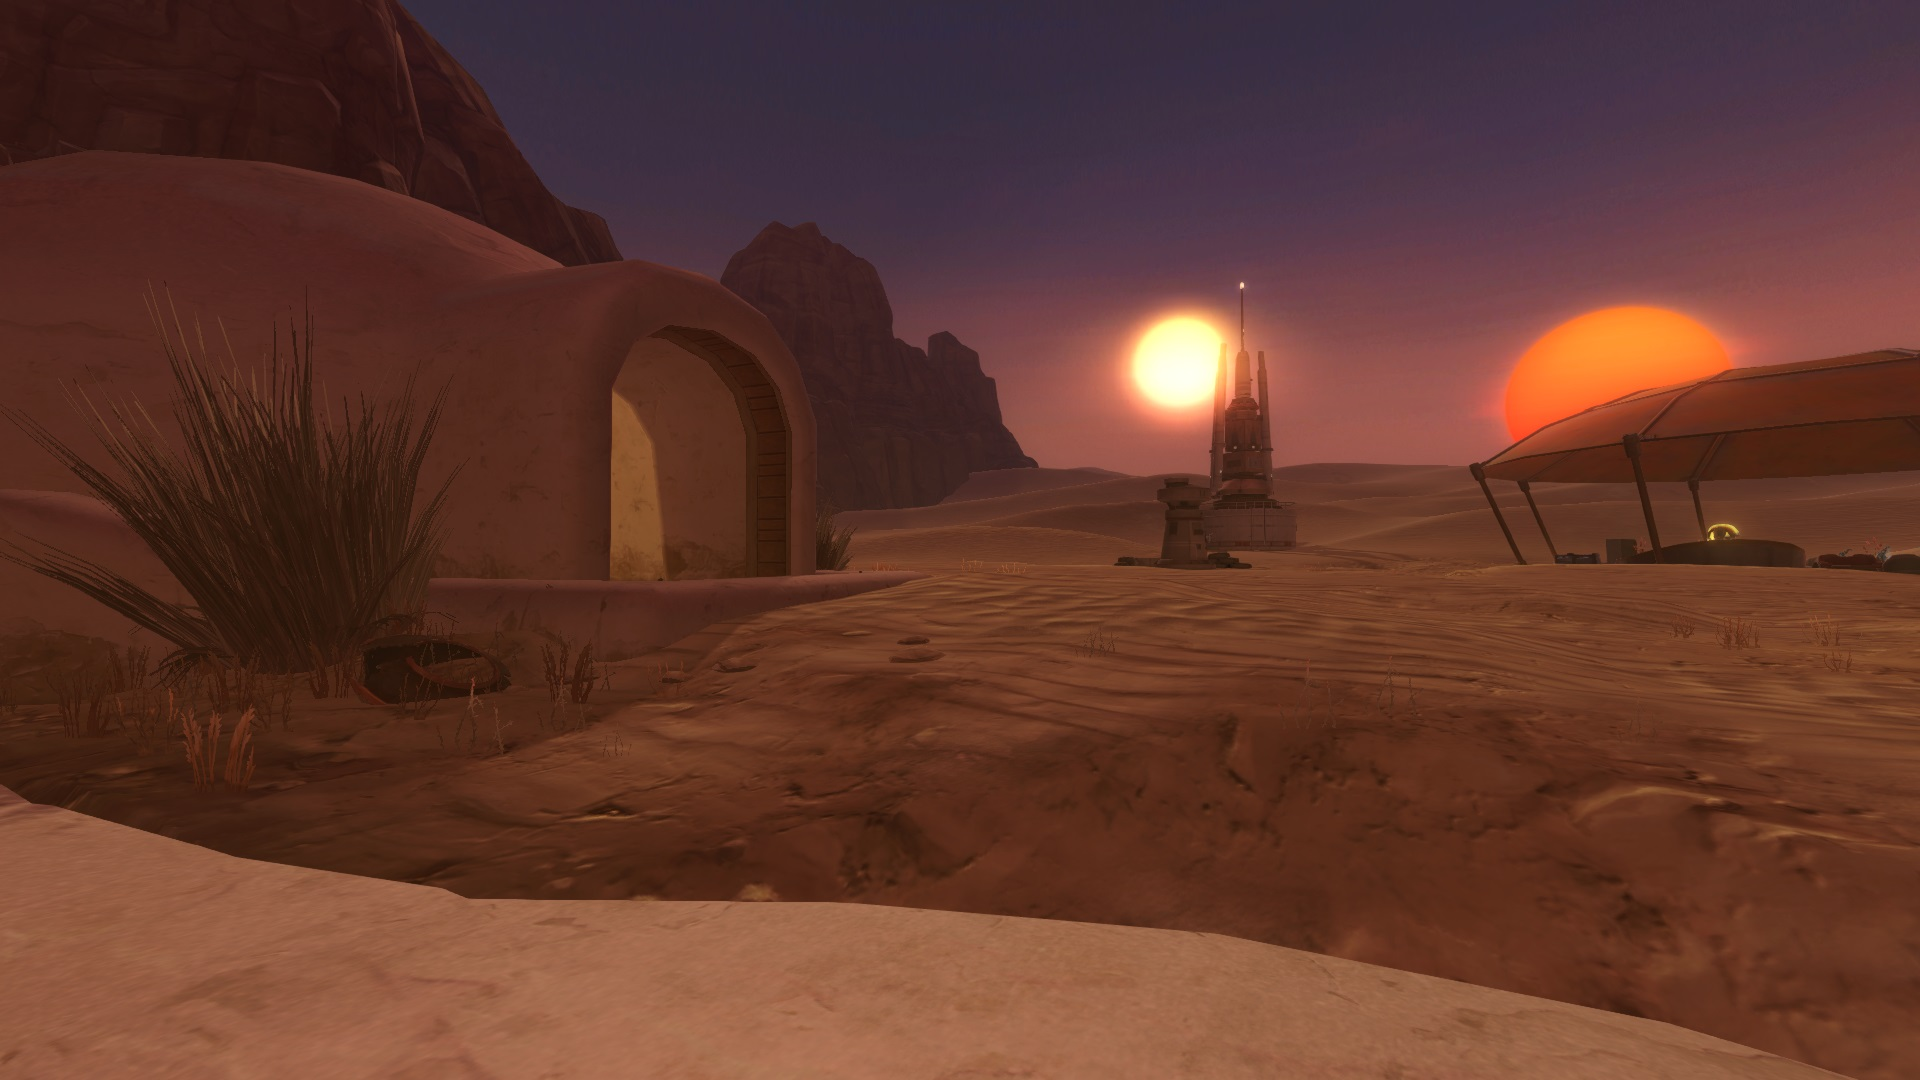 Screenshot from SWTOR's desert